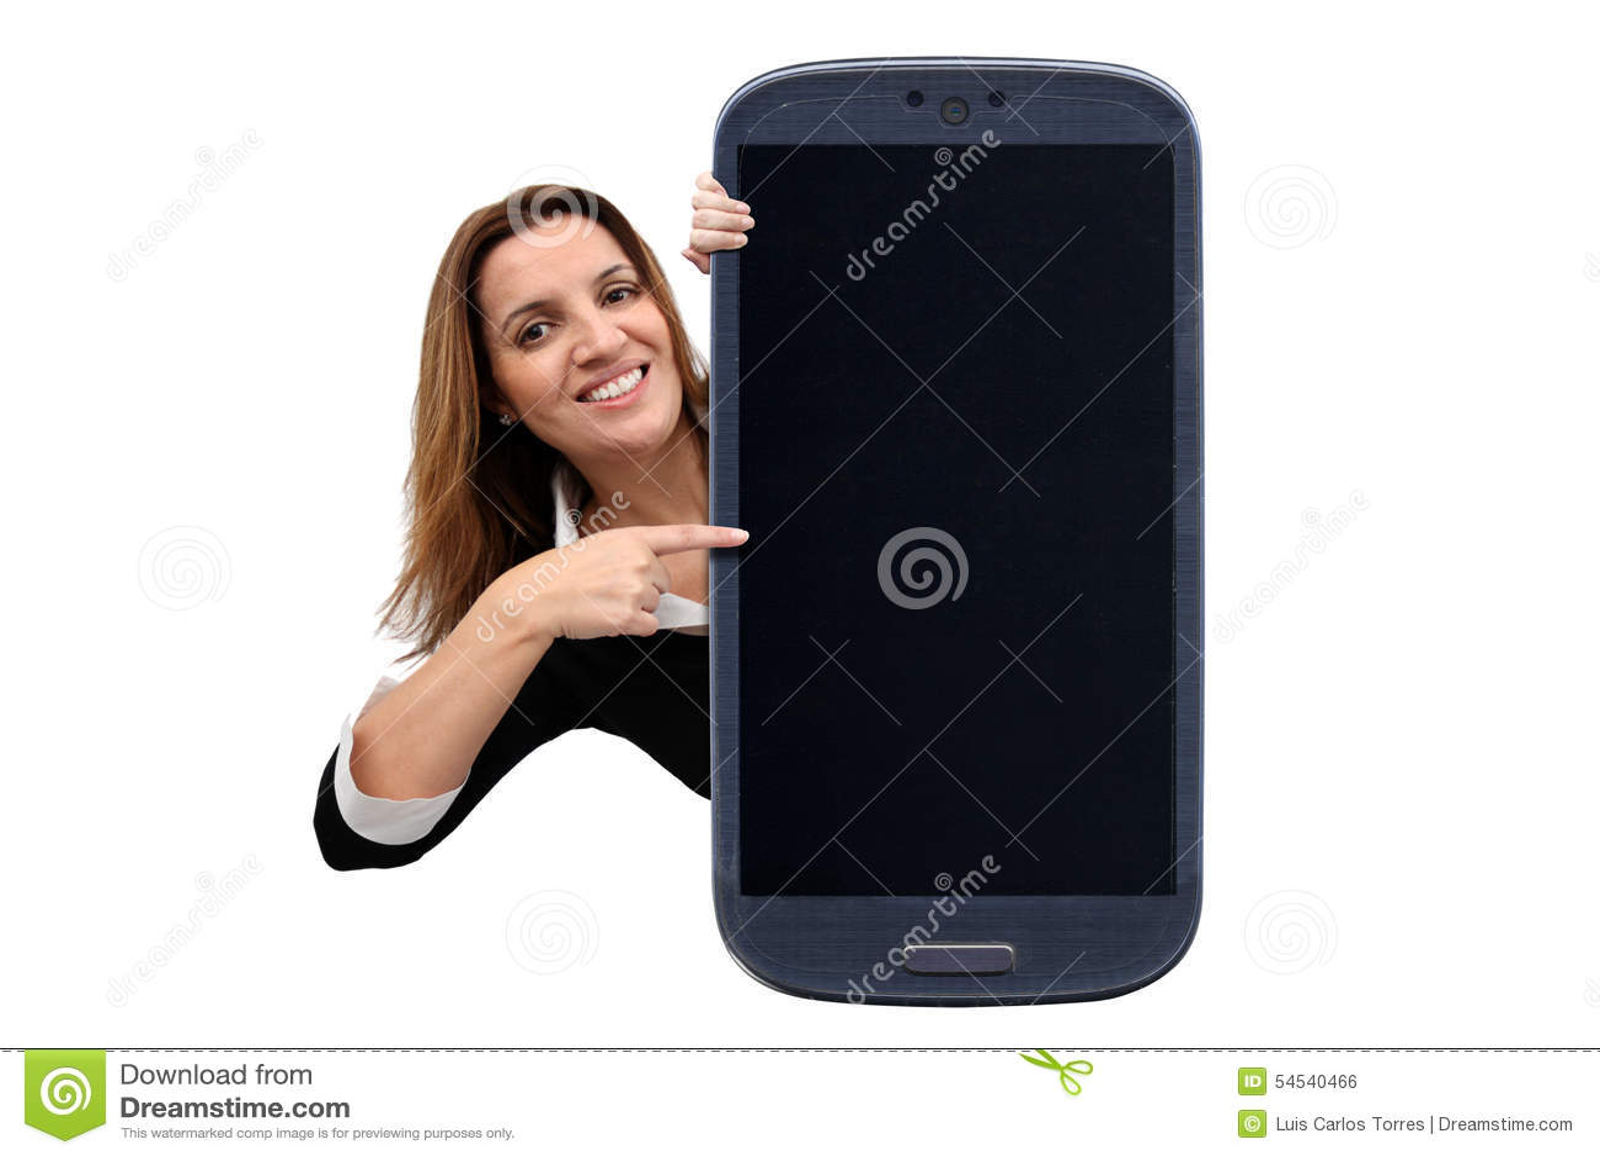 Amazing Smartphone thing